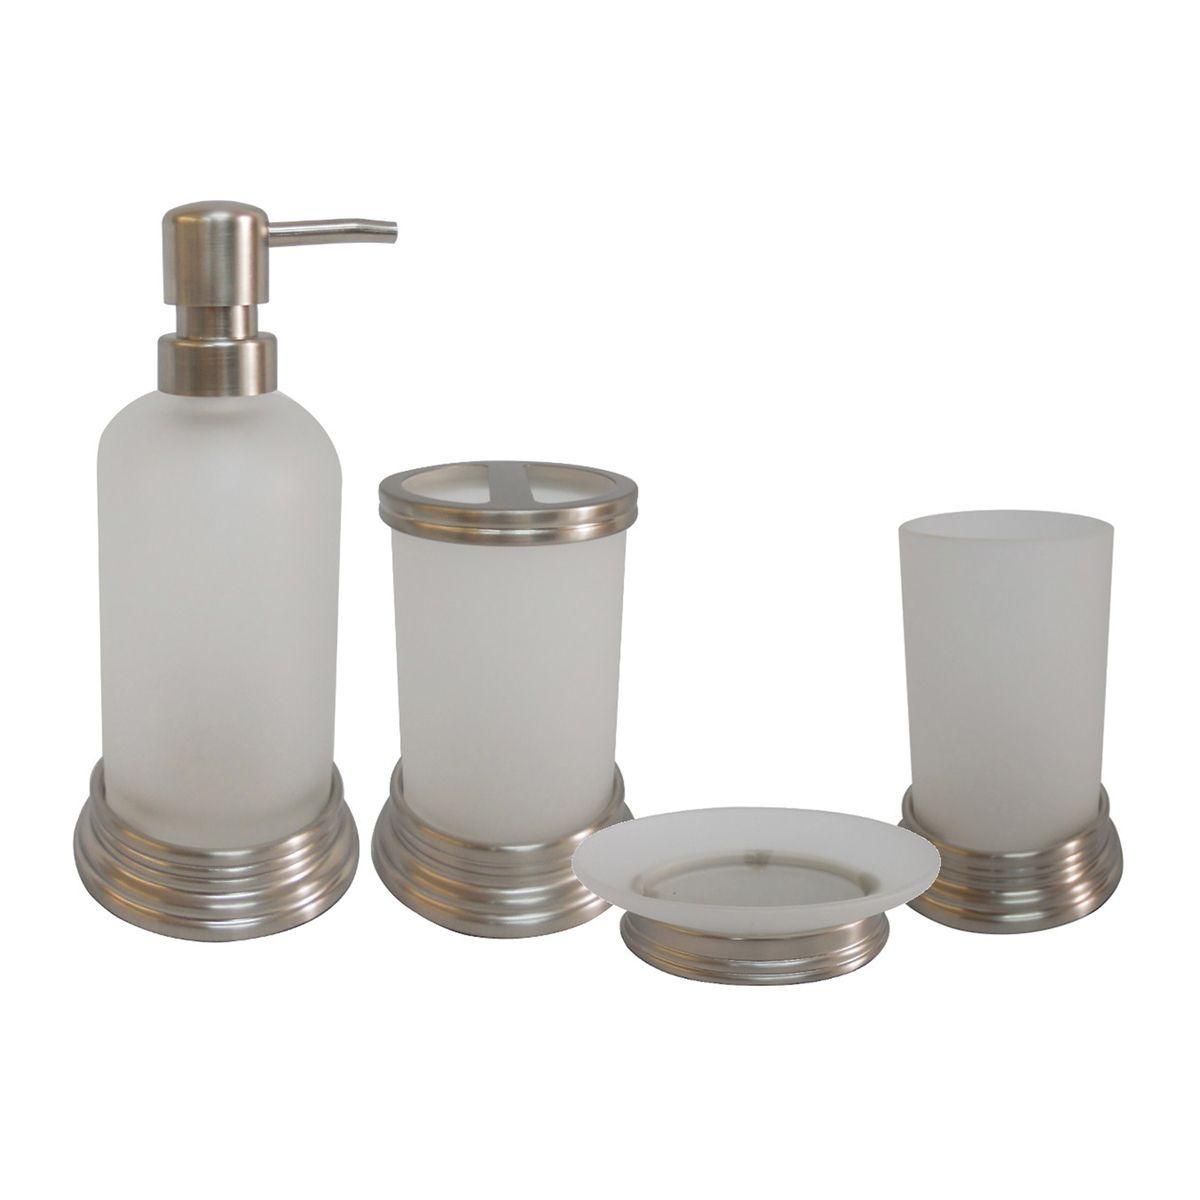 Misty Glass And Chrome Bath Accessory Piece Set Overstock